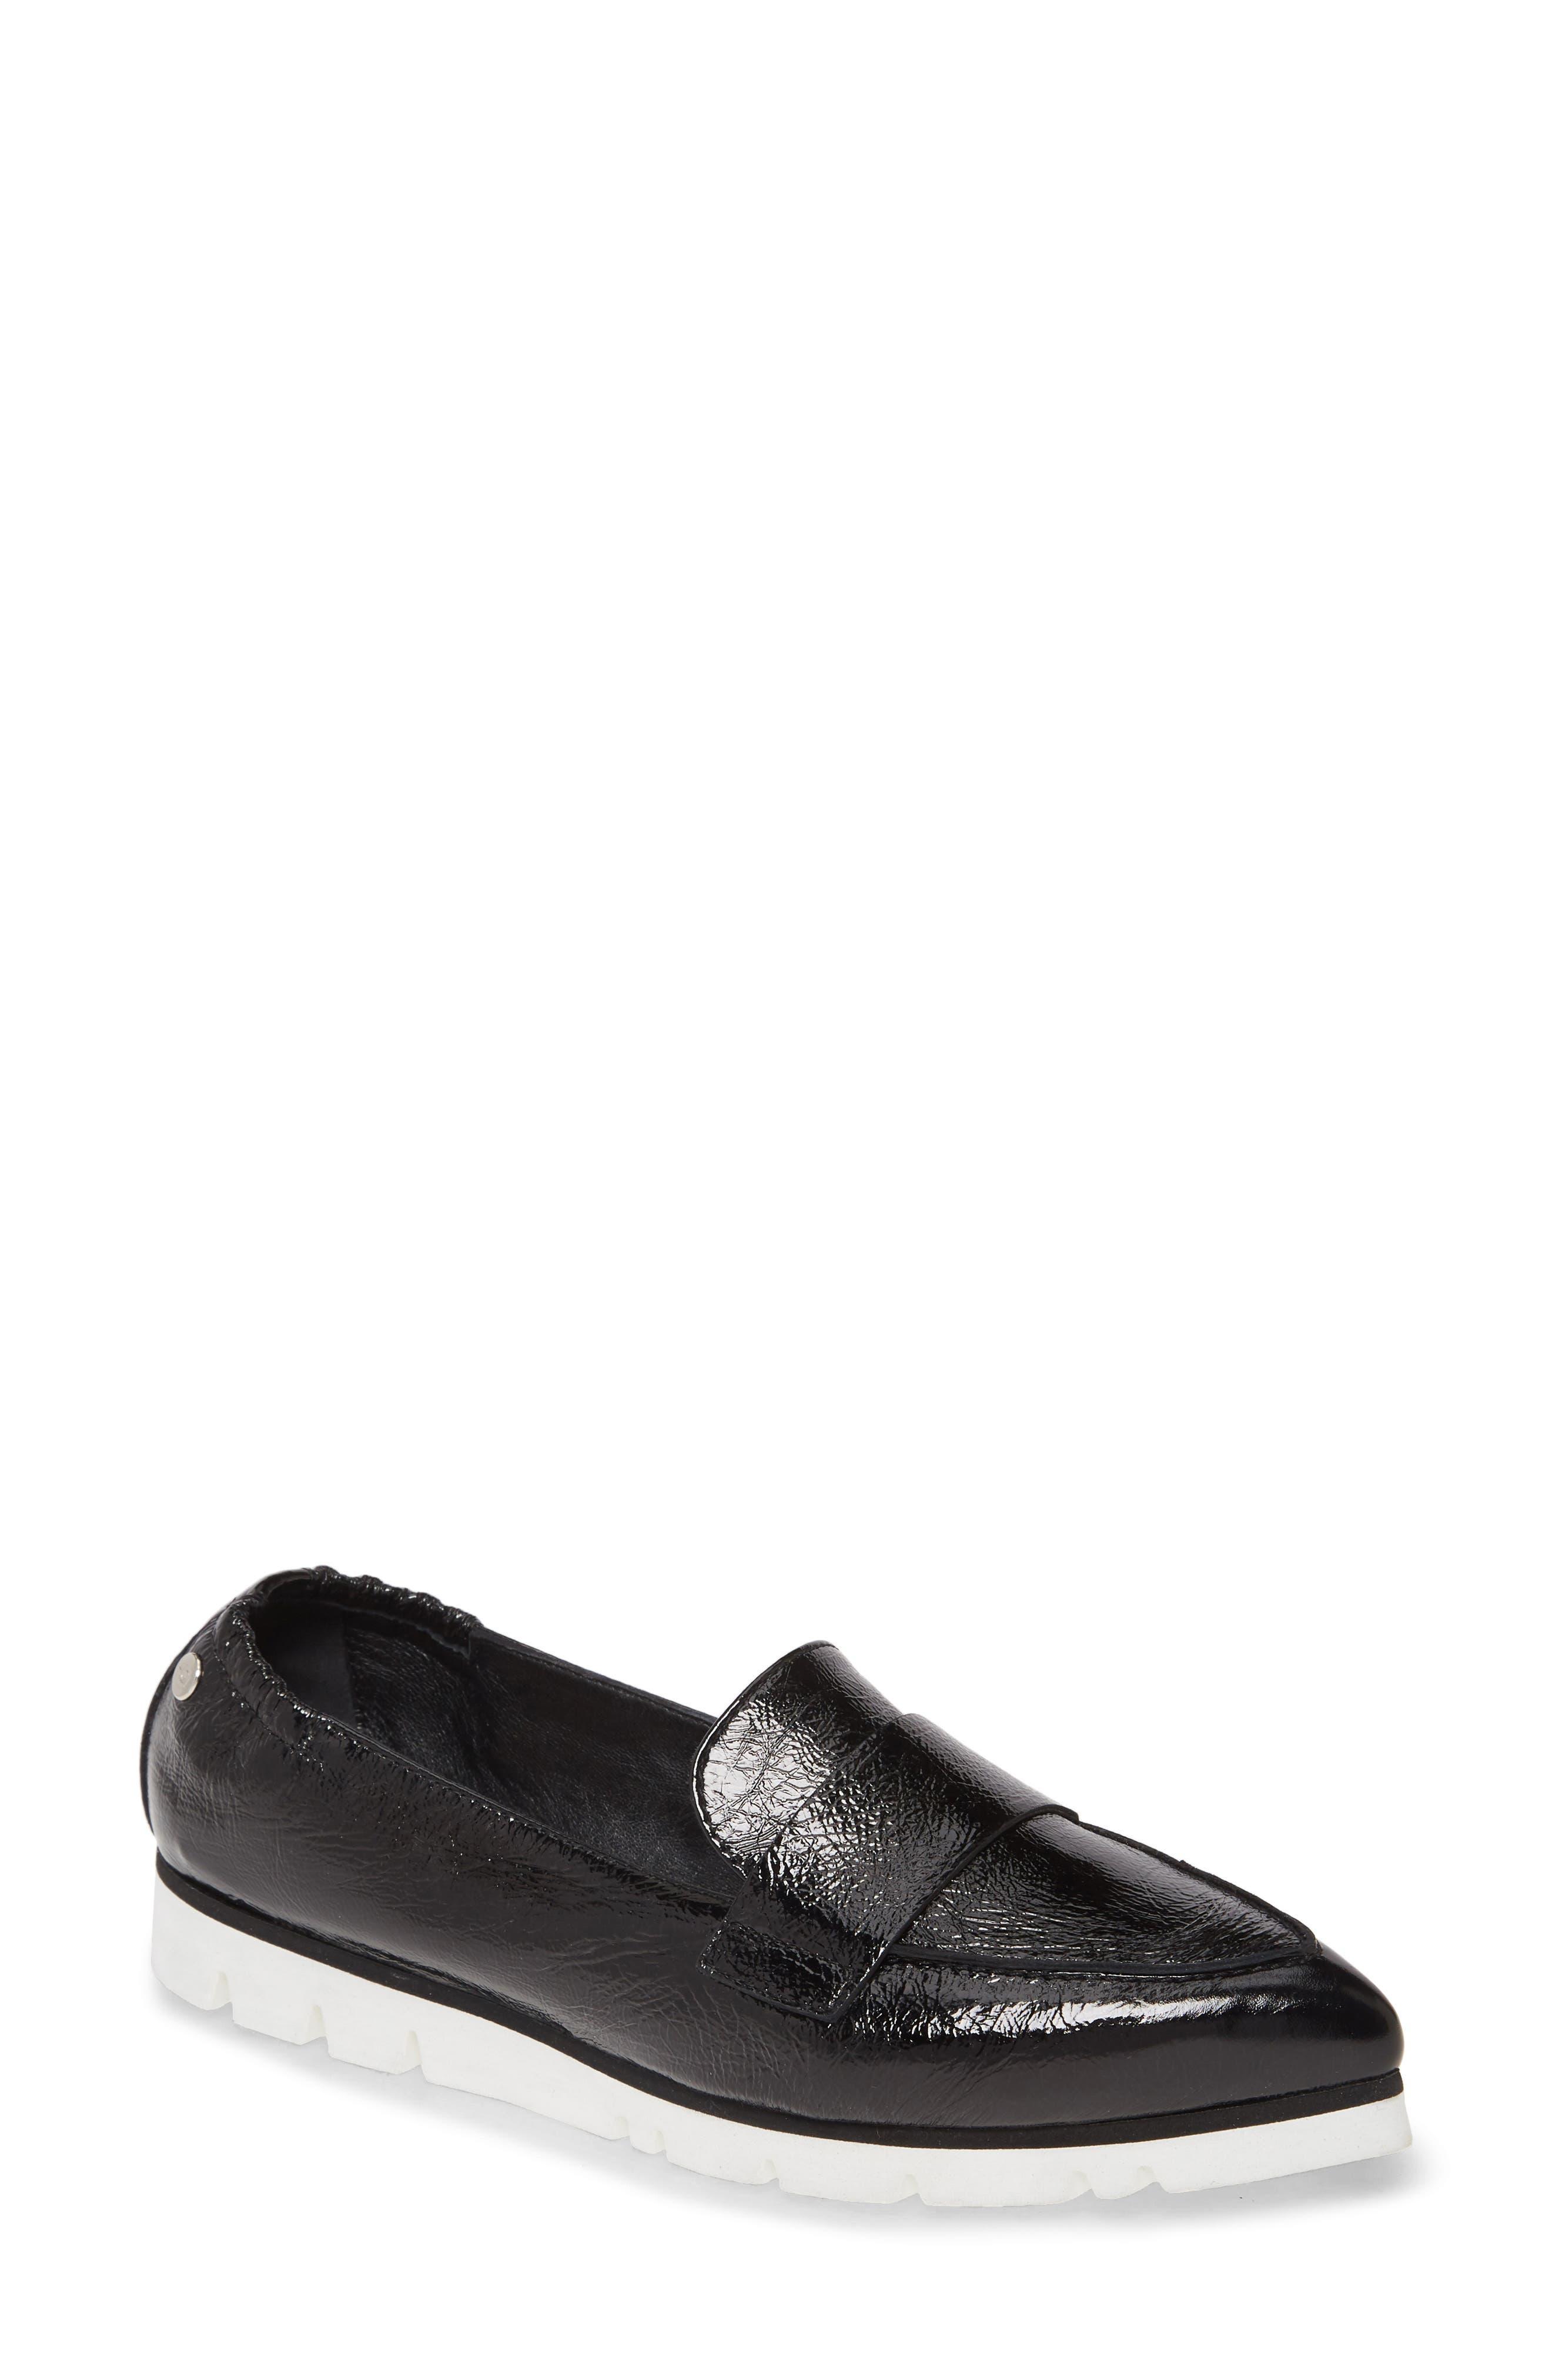 Women's AGL Shoes Sale \u0026 Clearance